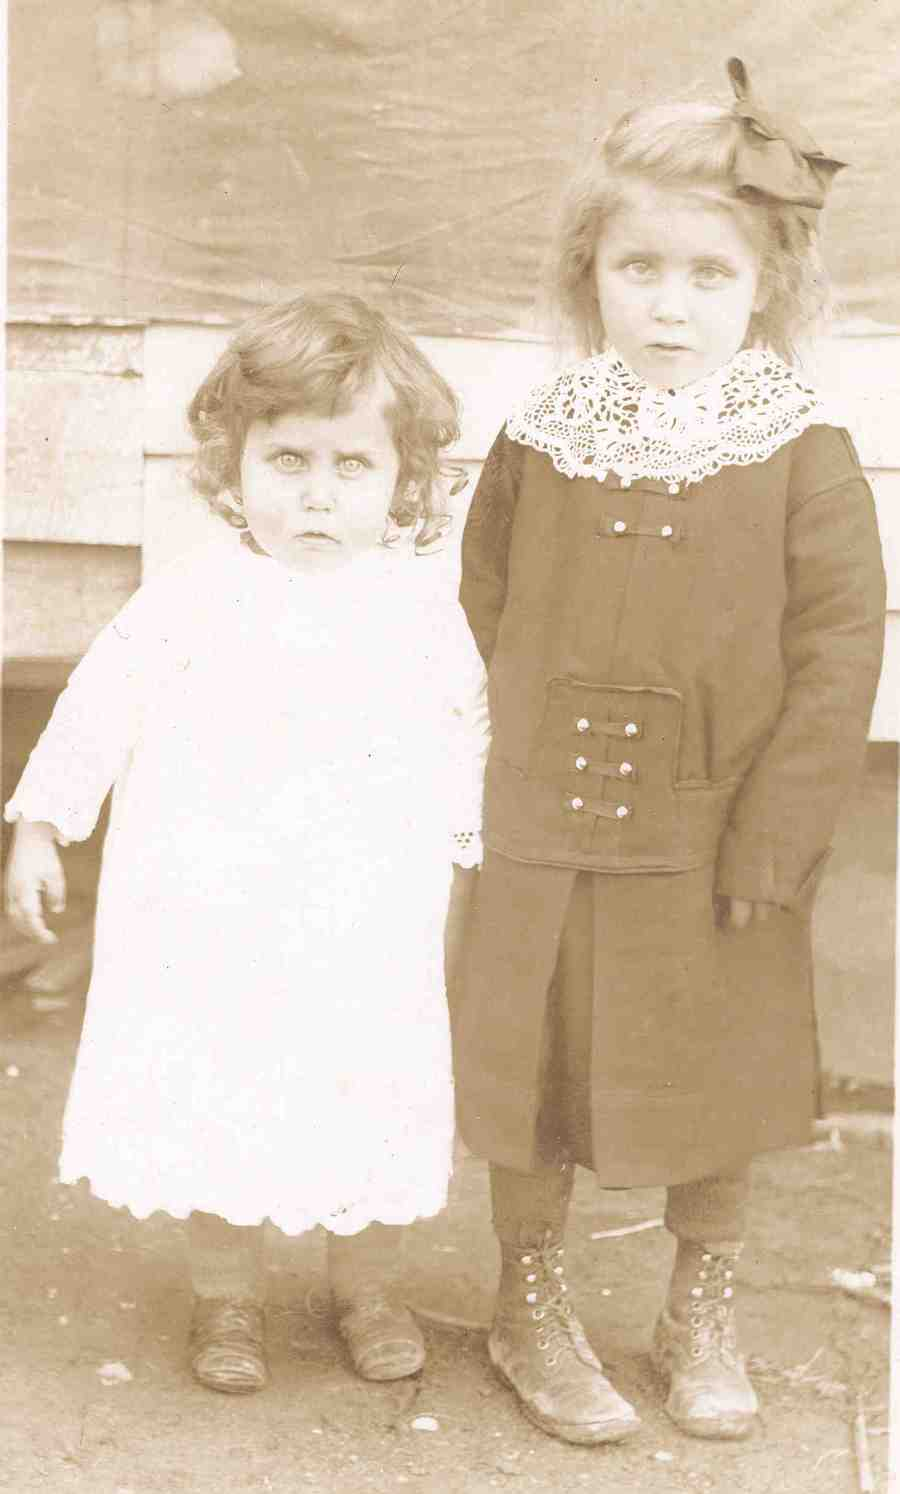 Gran and girl postcard